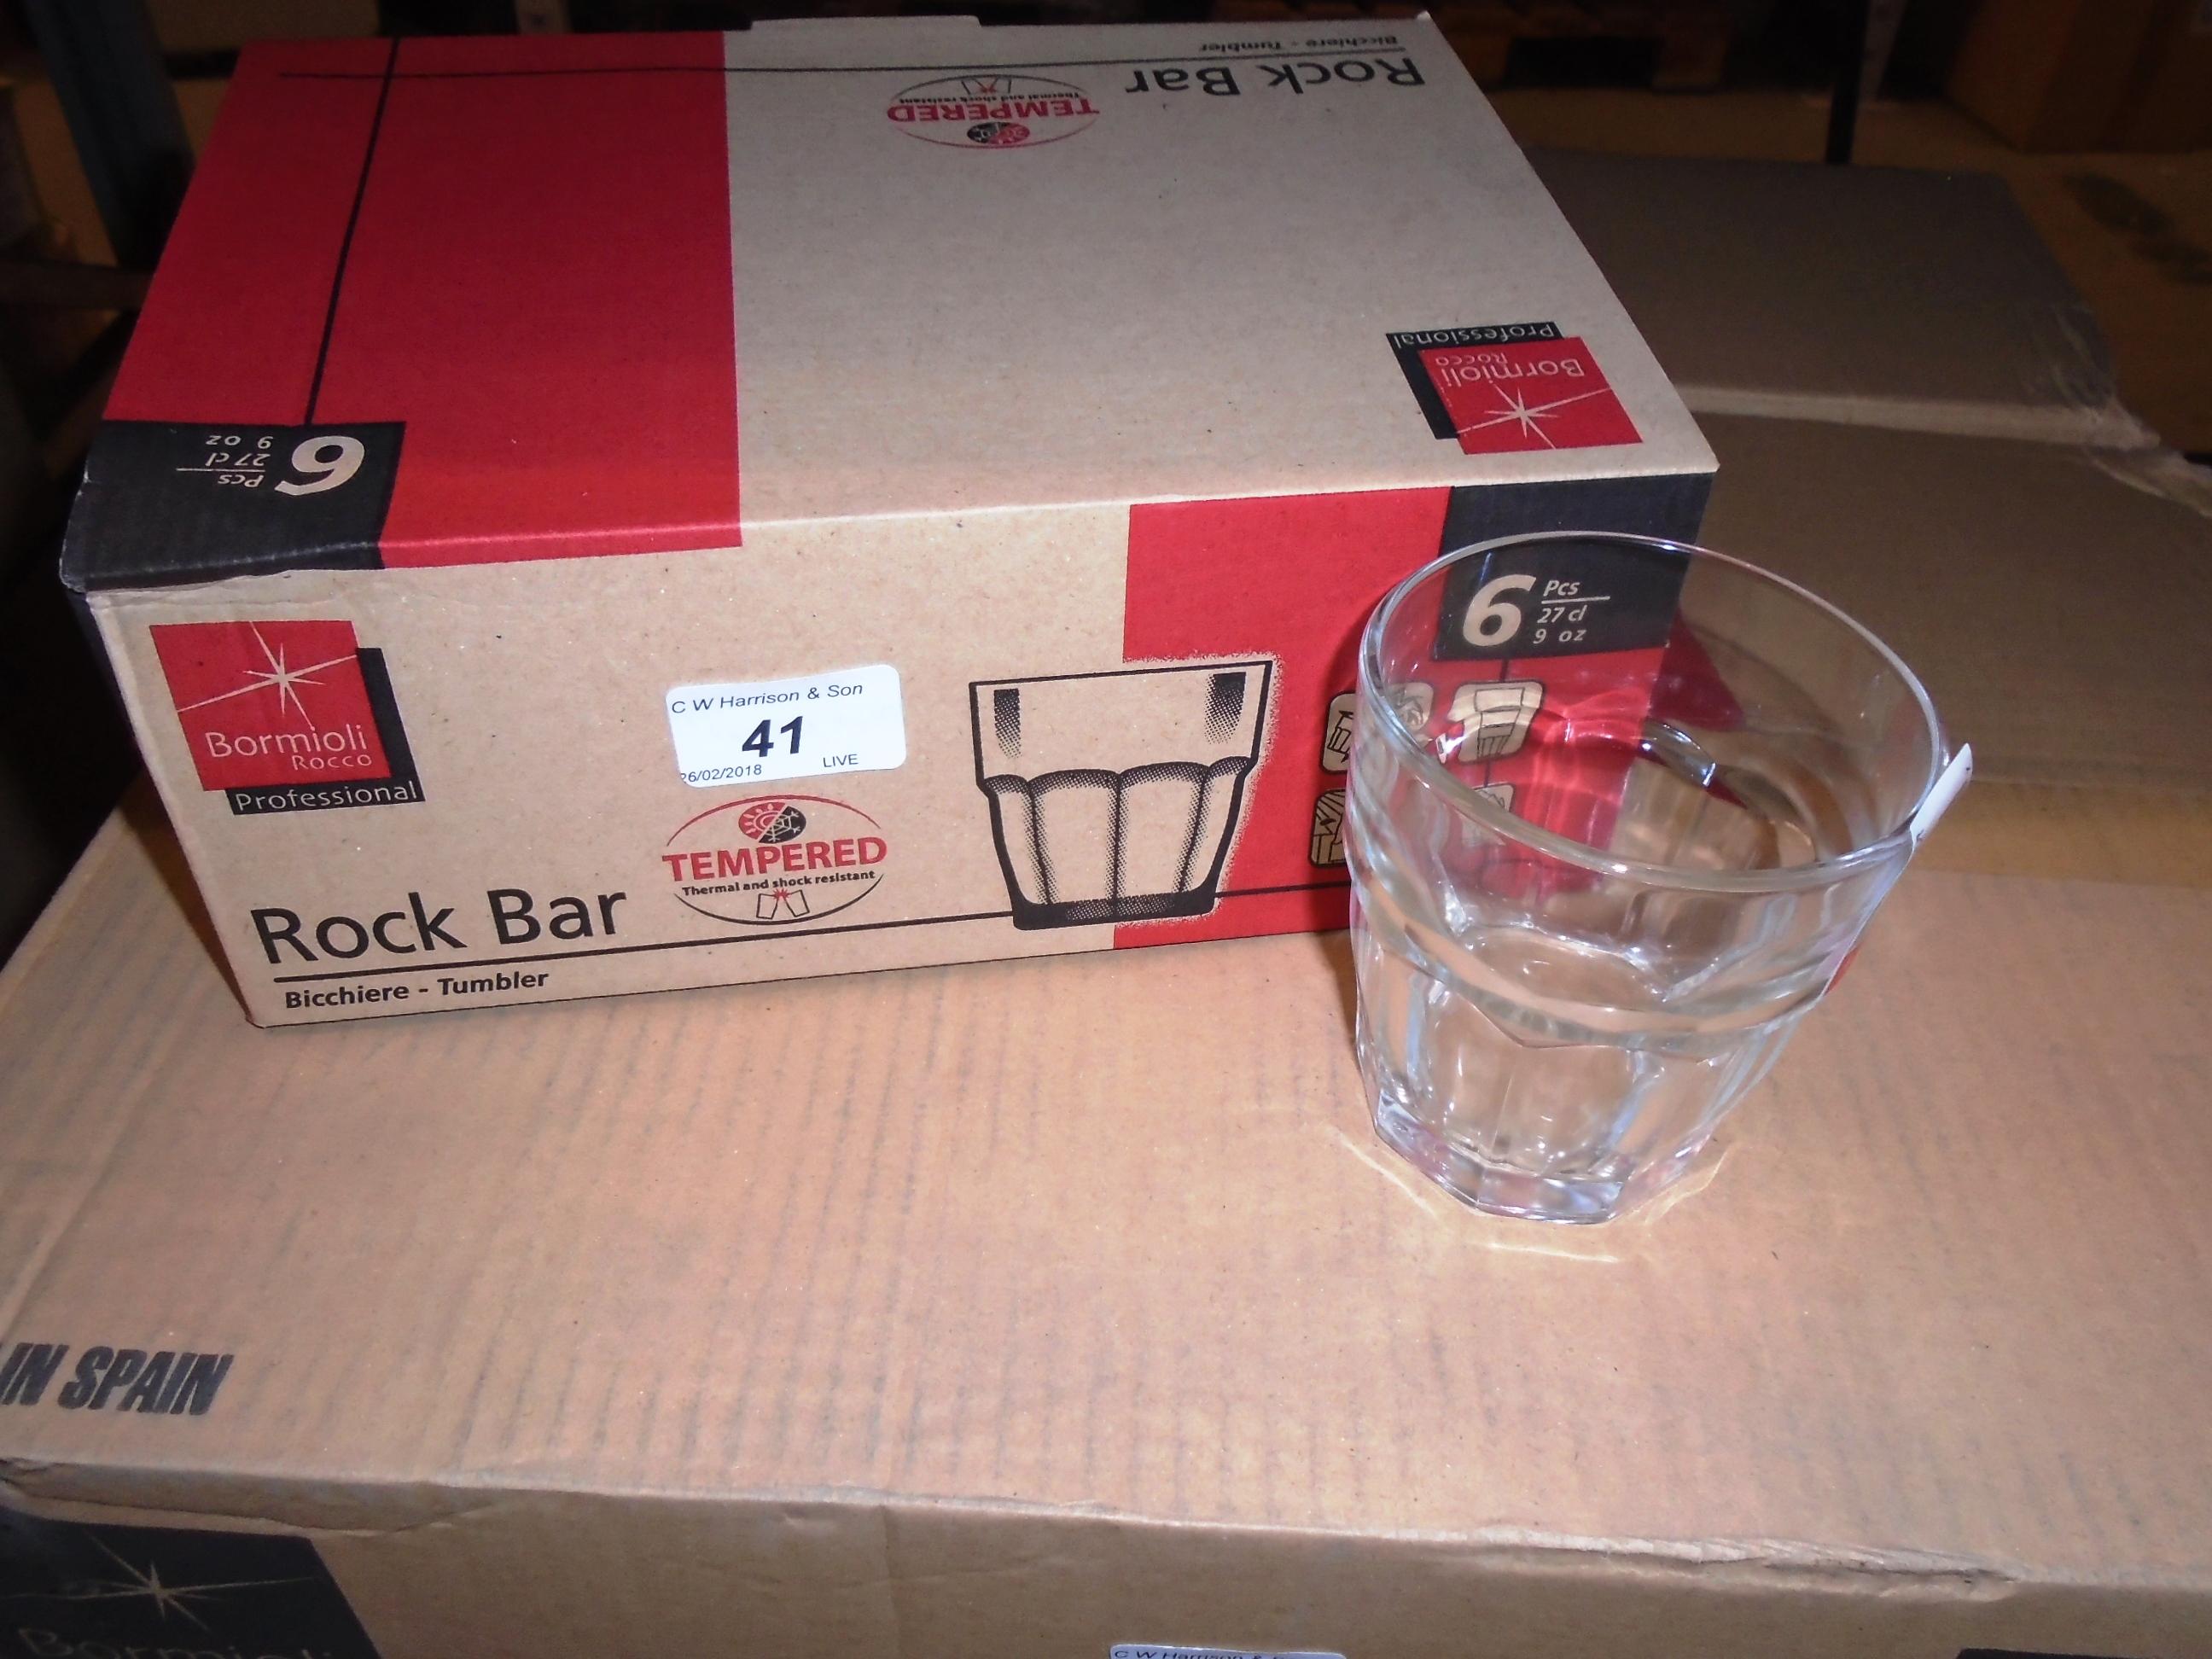 Lot 41 - 48 x Bormioli rock bar glasses - 1 x outer box